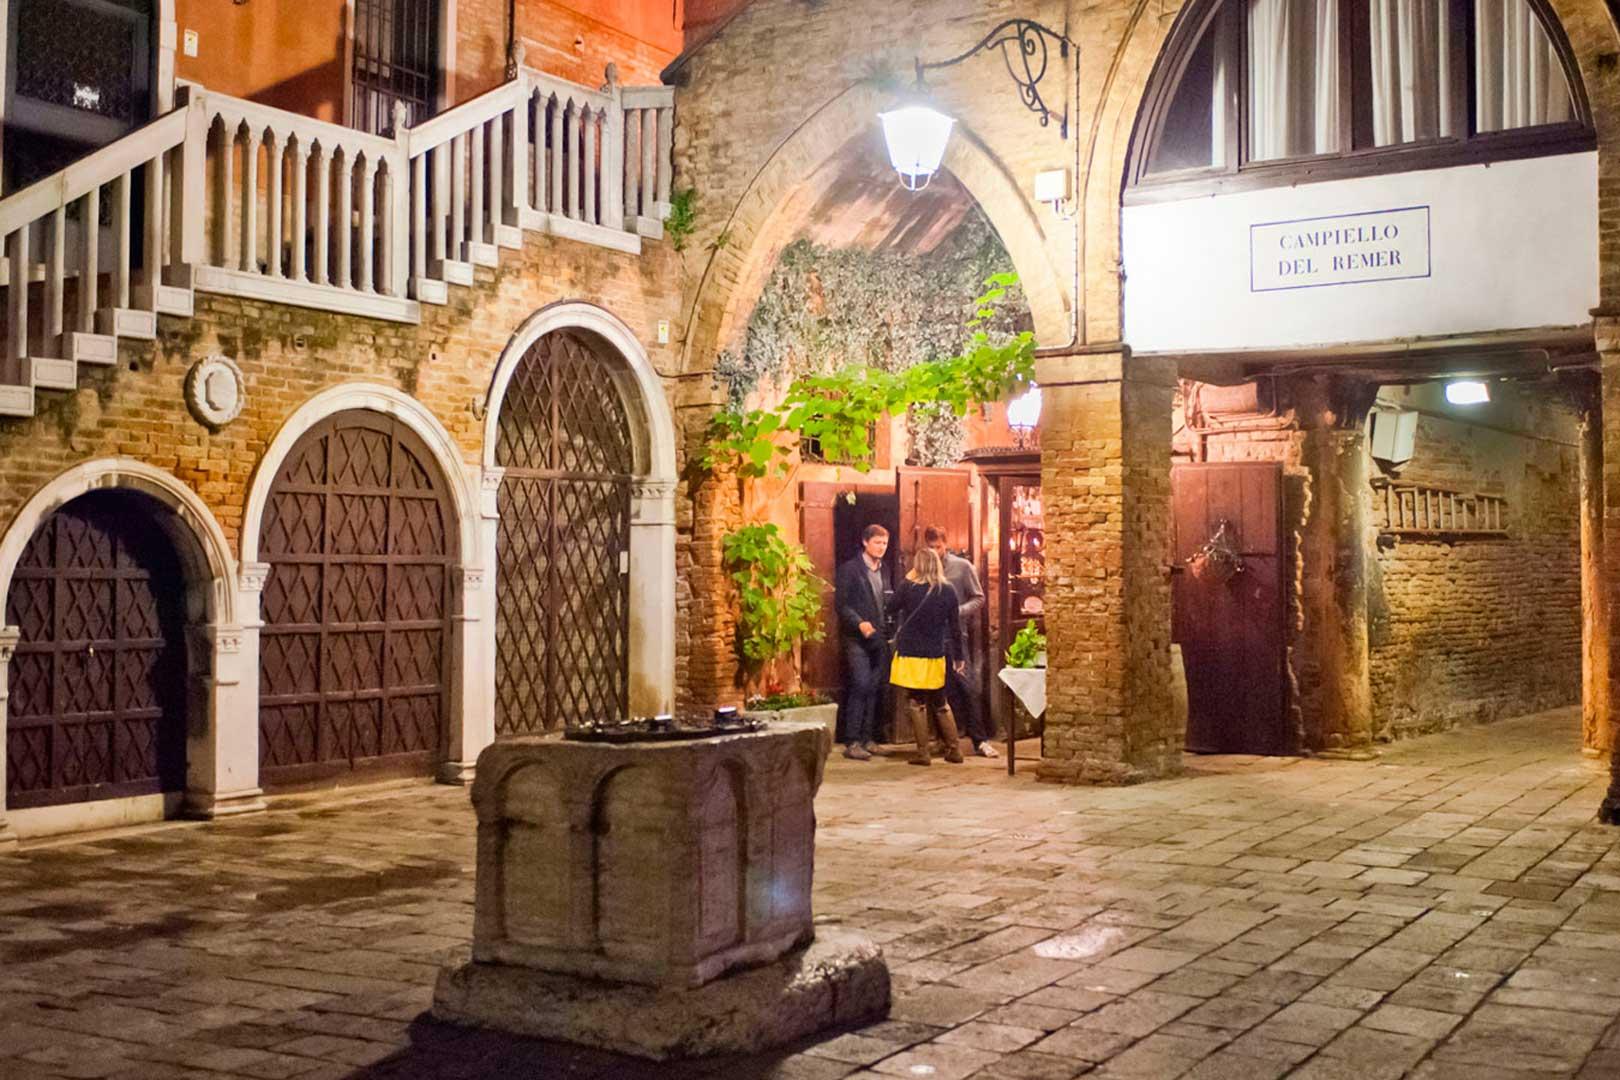 Taverna Al Remer